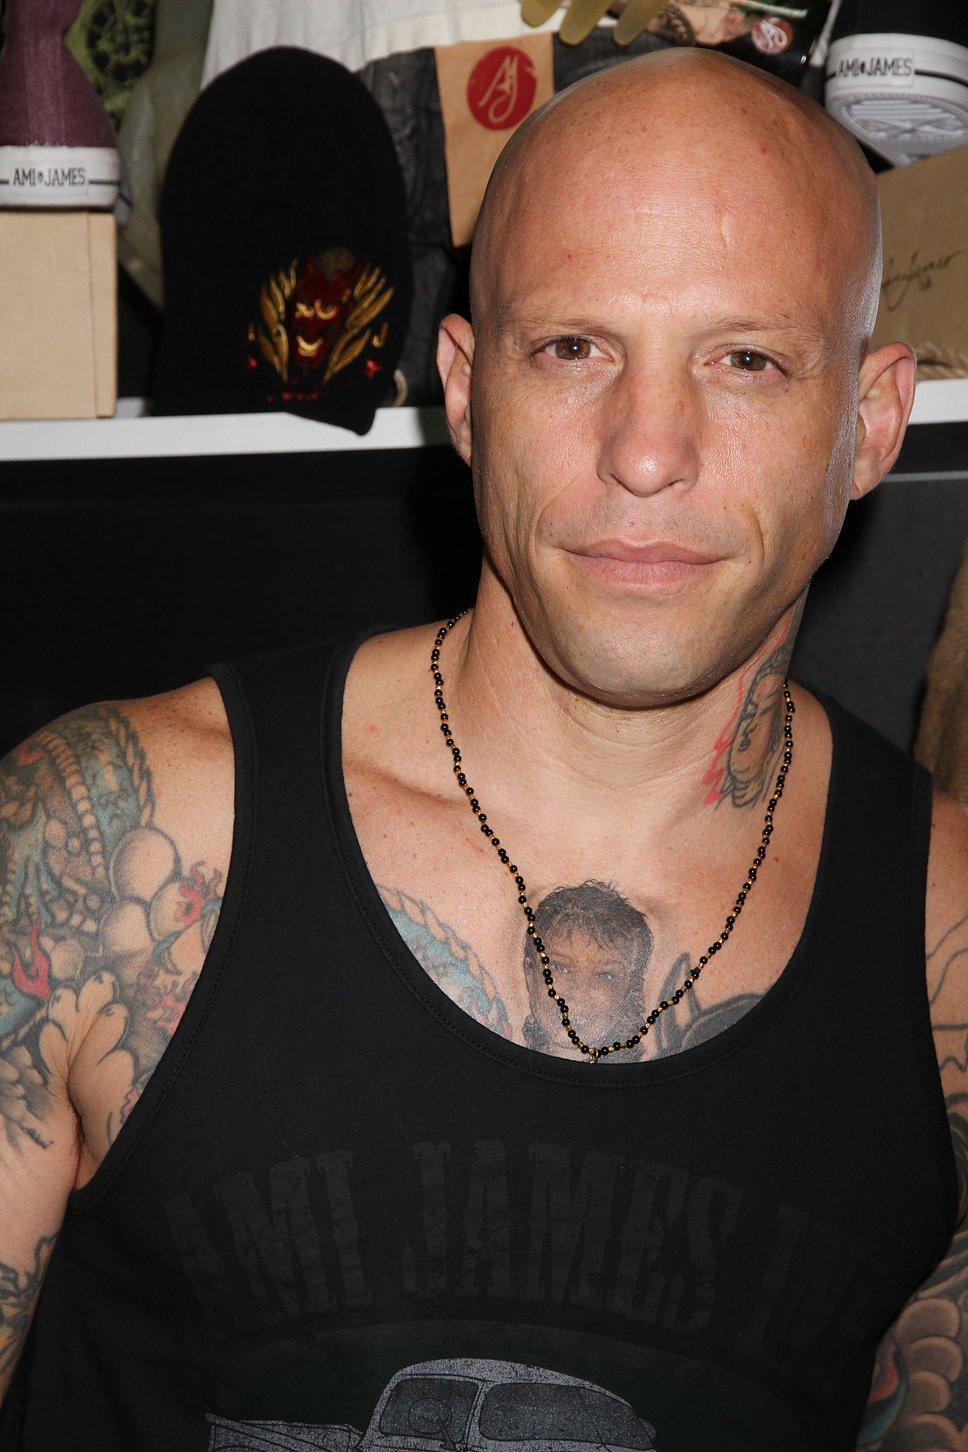 ami_james_black_tank_top_bald